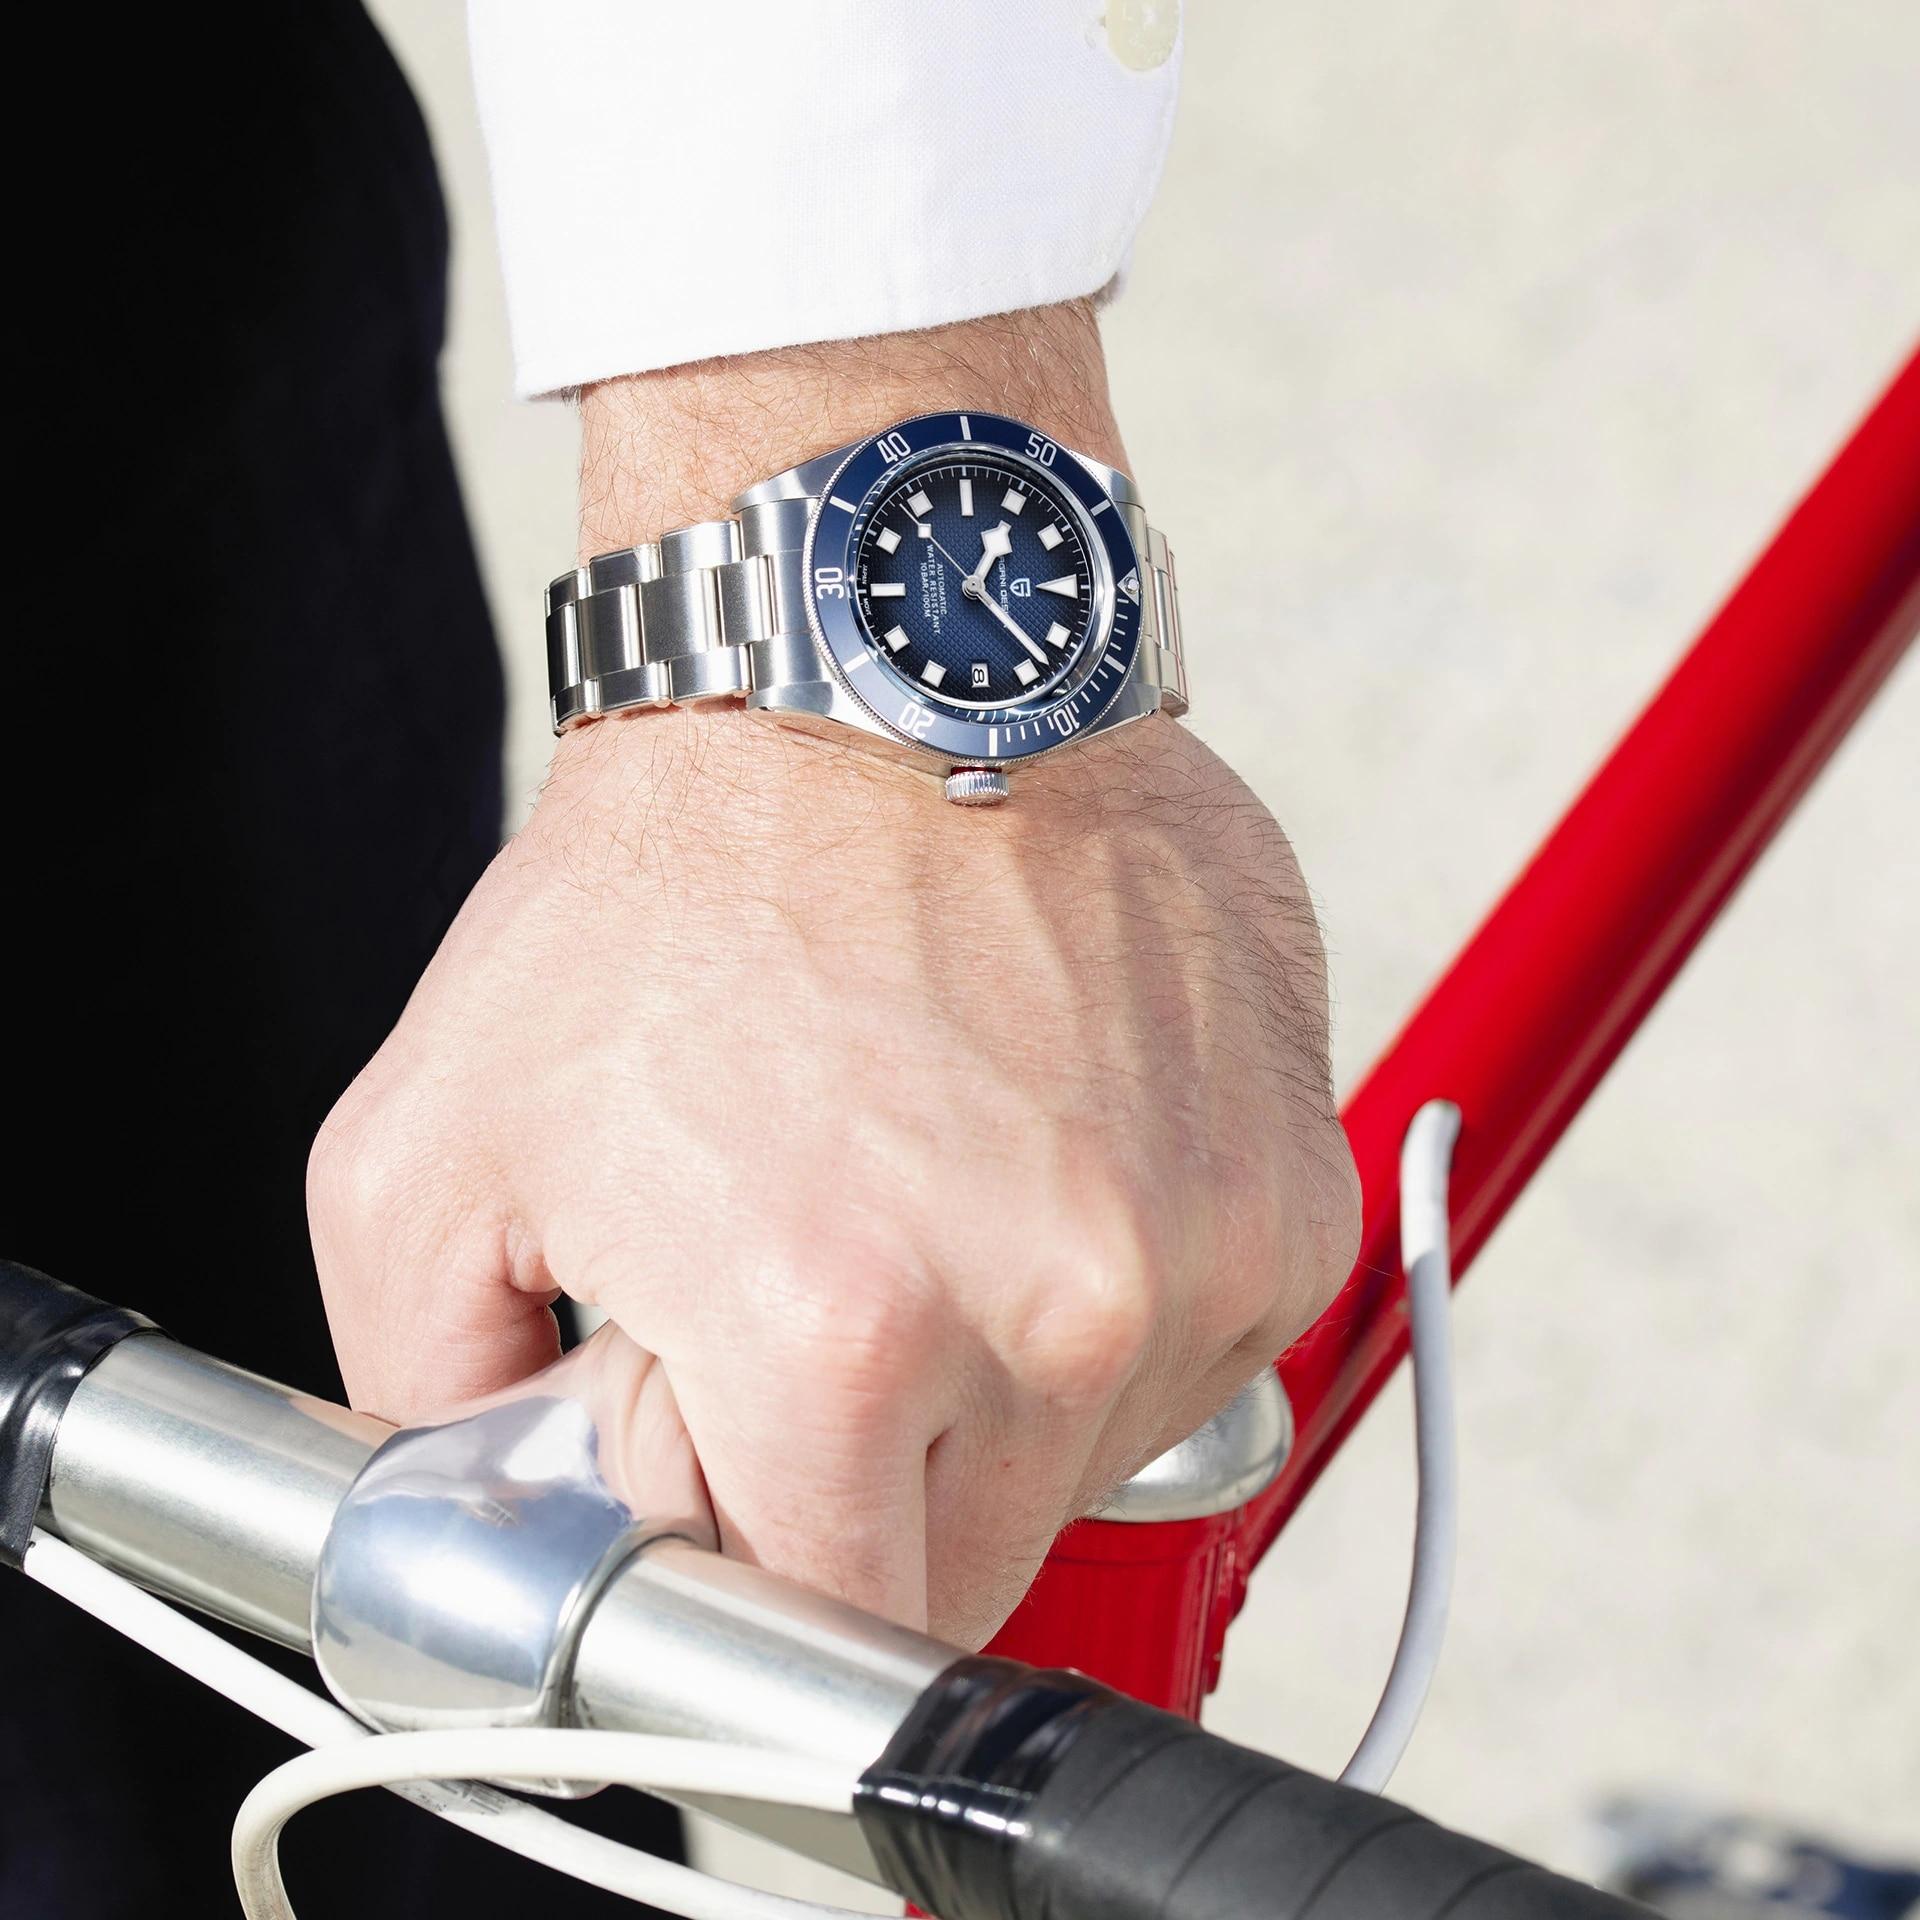 2021 New PAGANI DESIGN BB58 Men's Watches Mechanical Watch For Men Luxury Automatic Watch Men NH35/8215 Waterproof Reloj Hombre 2